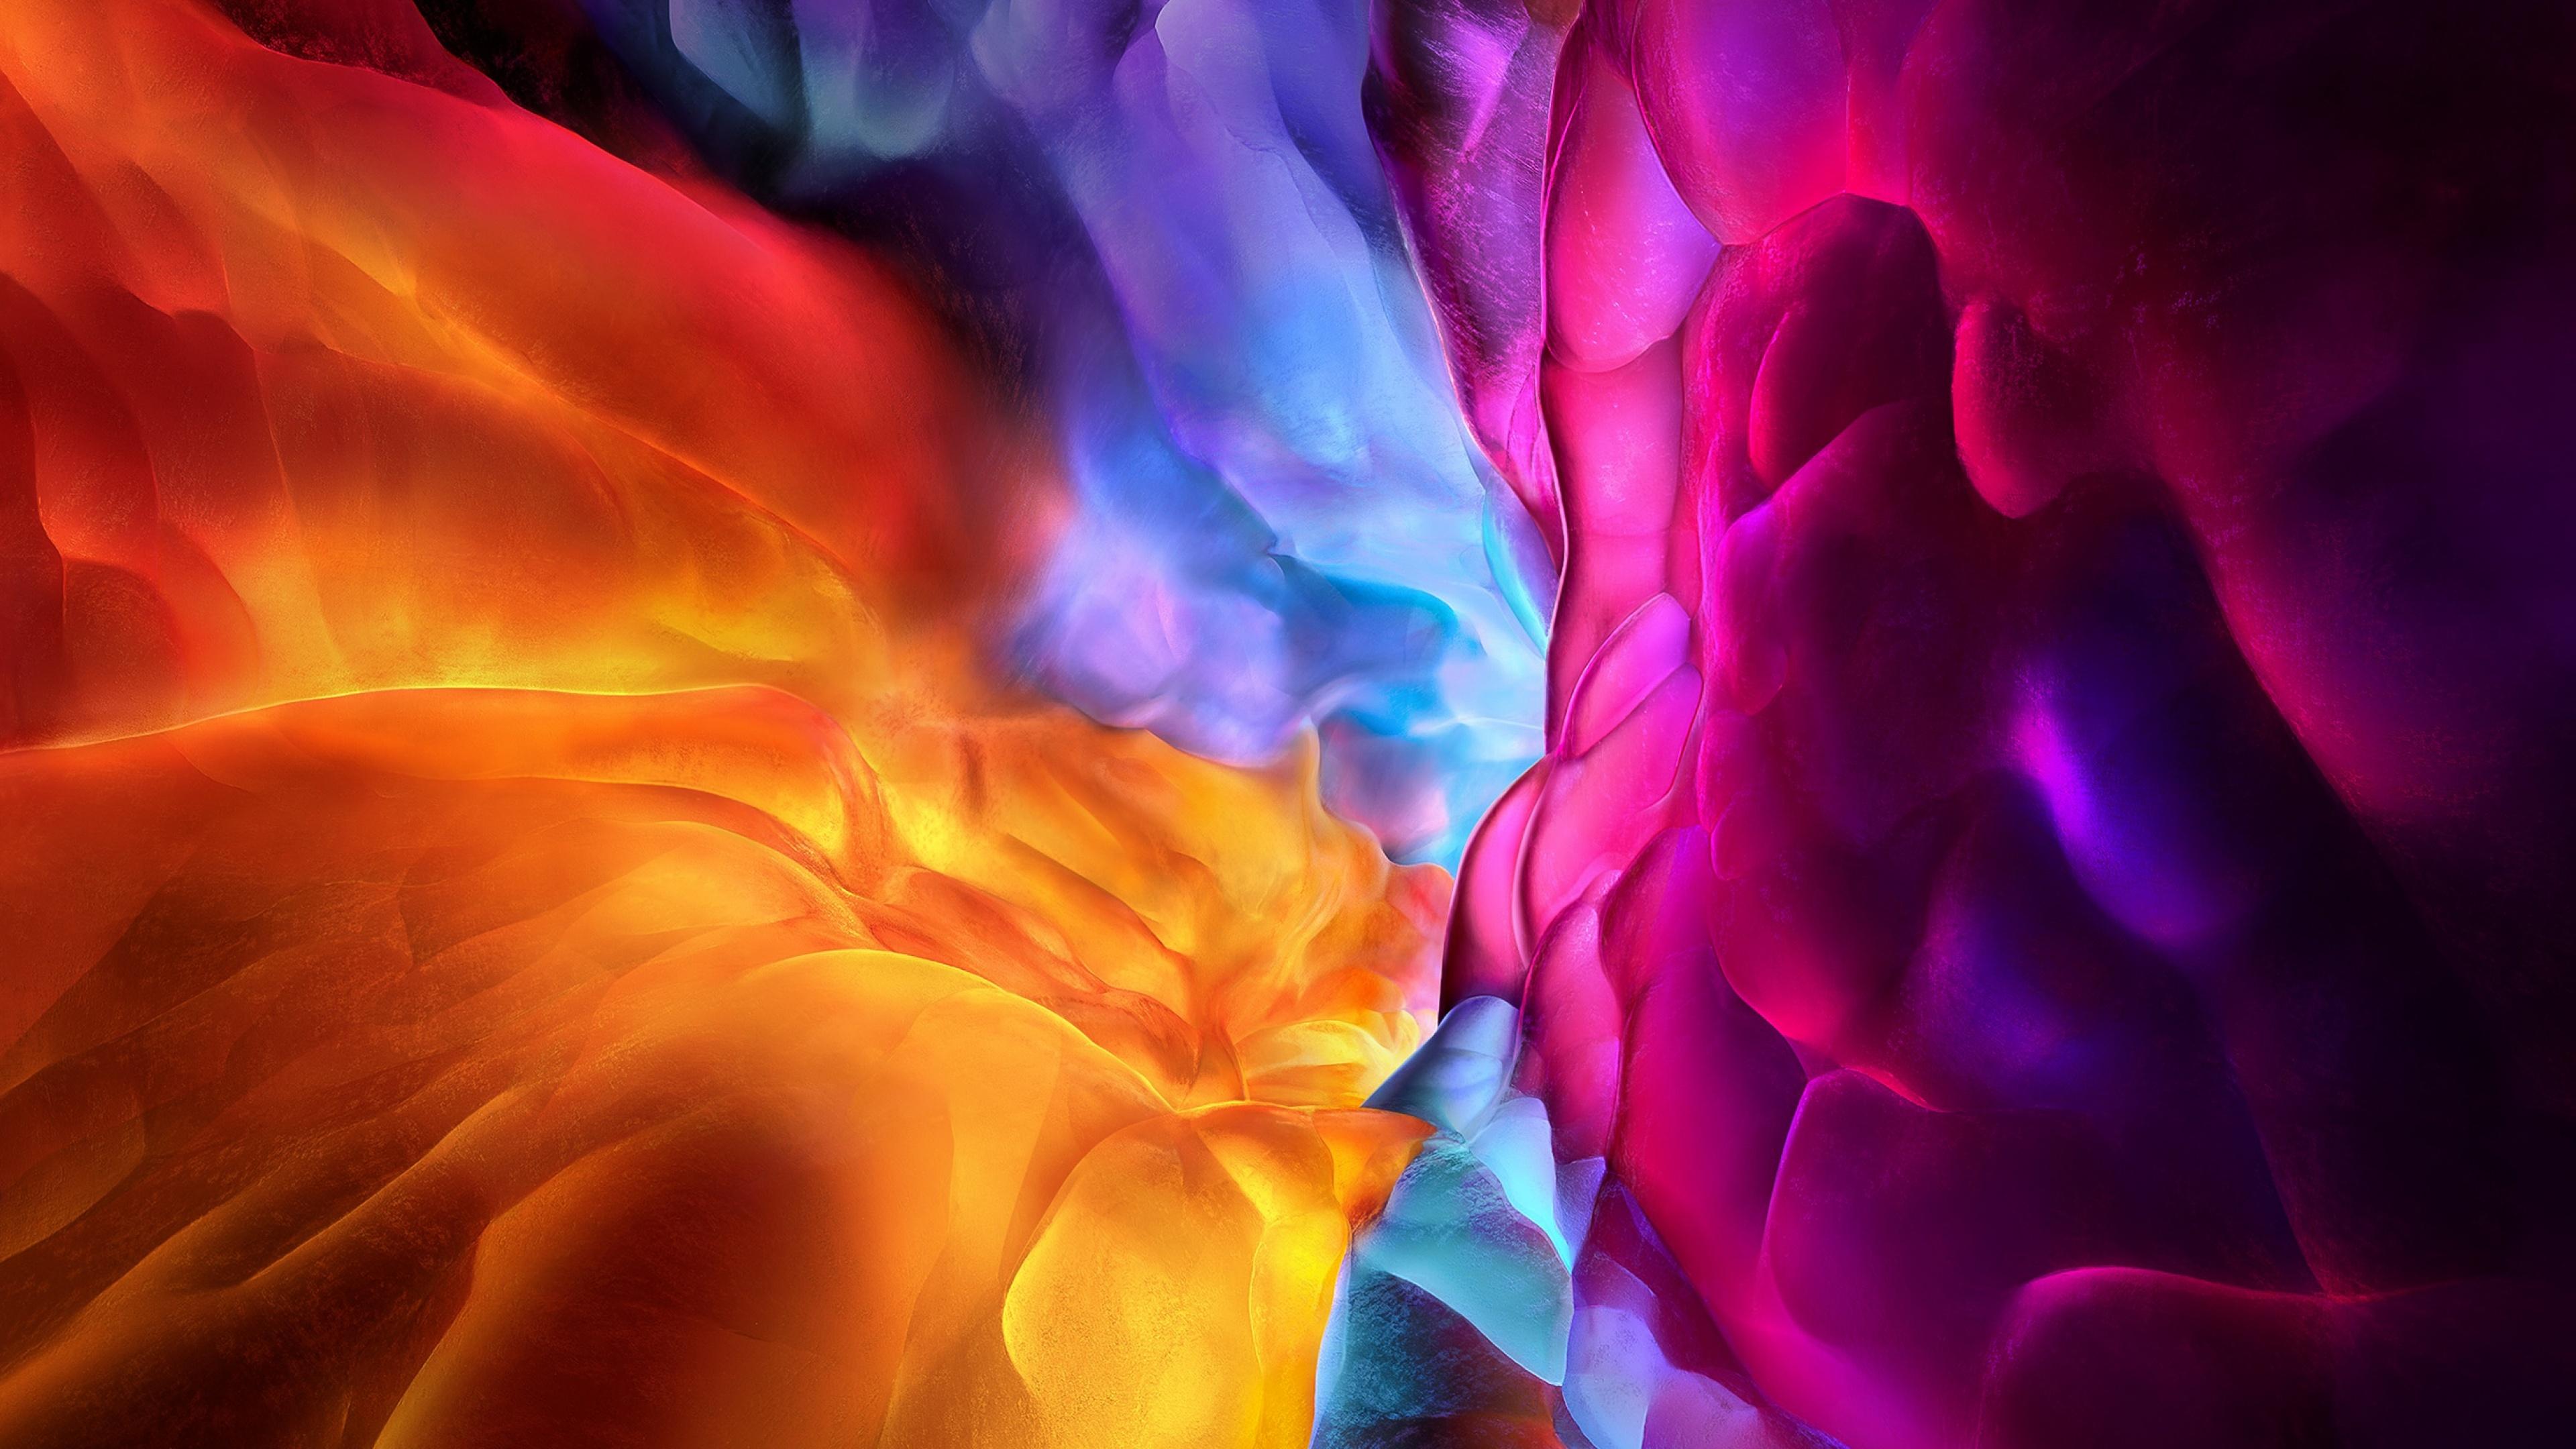 Ipad Pro 4k Wallpaper Stock 2020 Apple Hd Abstract 763